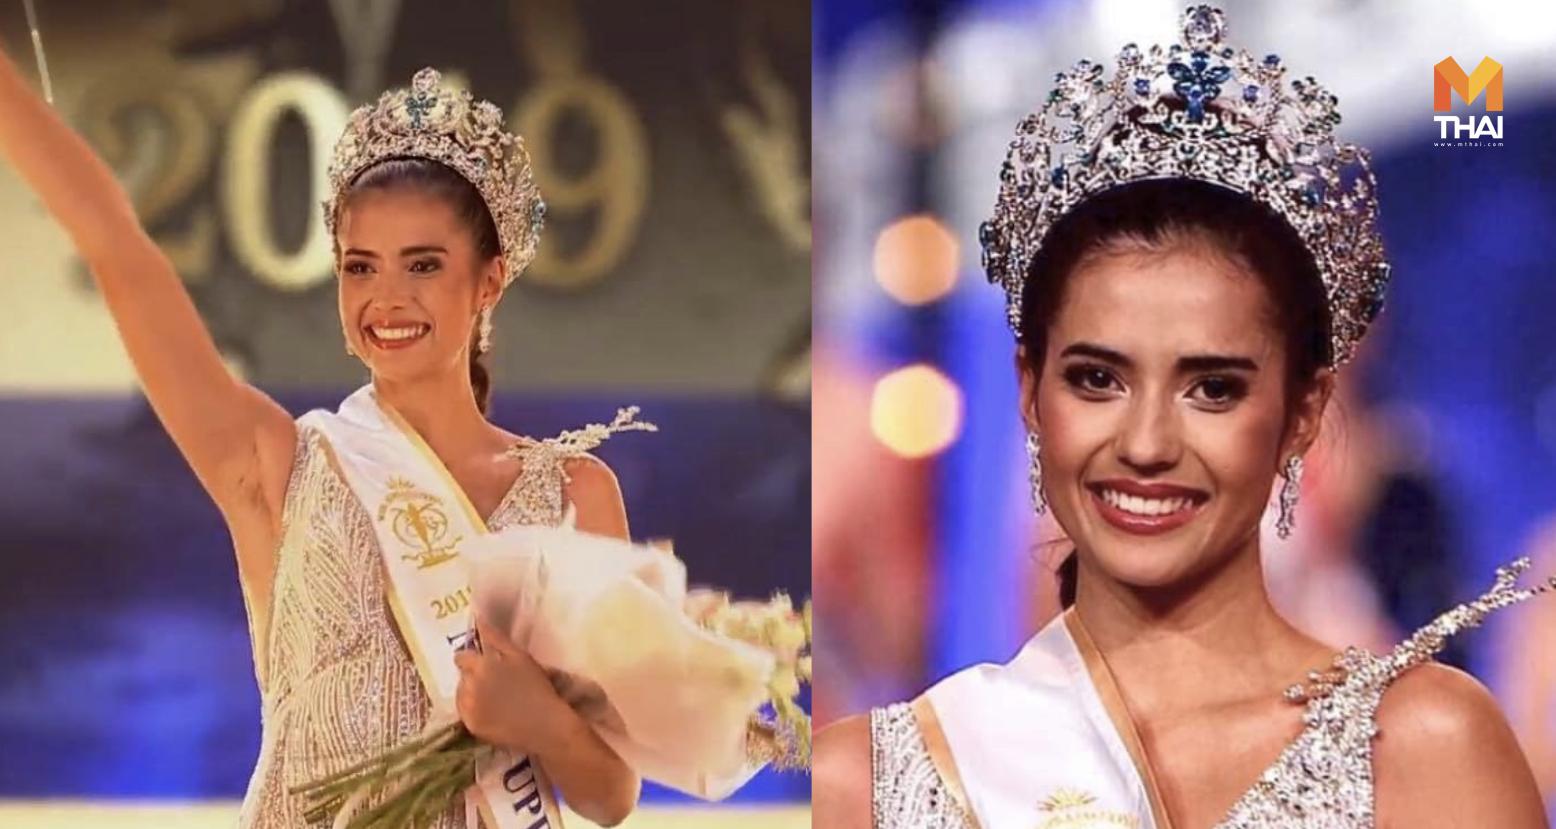 Miss Supranational Miss Supranational 2019 มิสซูปราเนชั่นแนล มิสซูปราเนชั่นแนล 2019 มิสซูปร้าเนชั่นแนลไทยแลนด์ แอน แอนโทเนีย โพซิ้ว